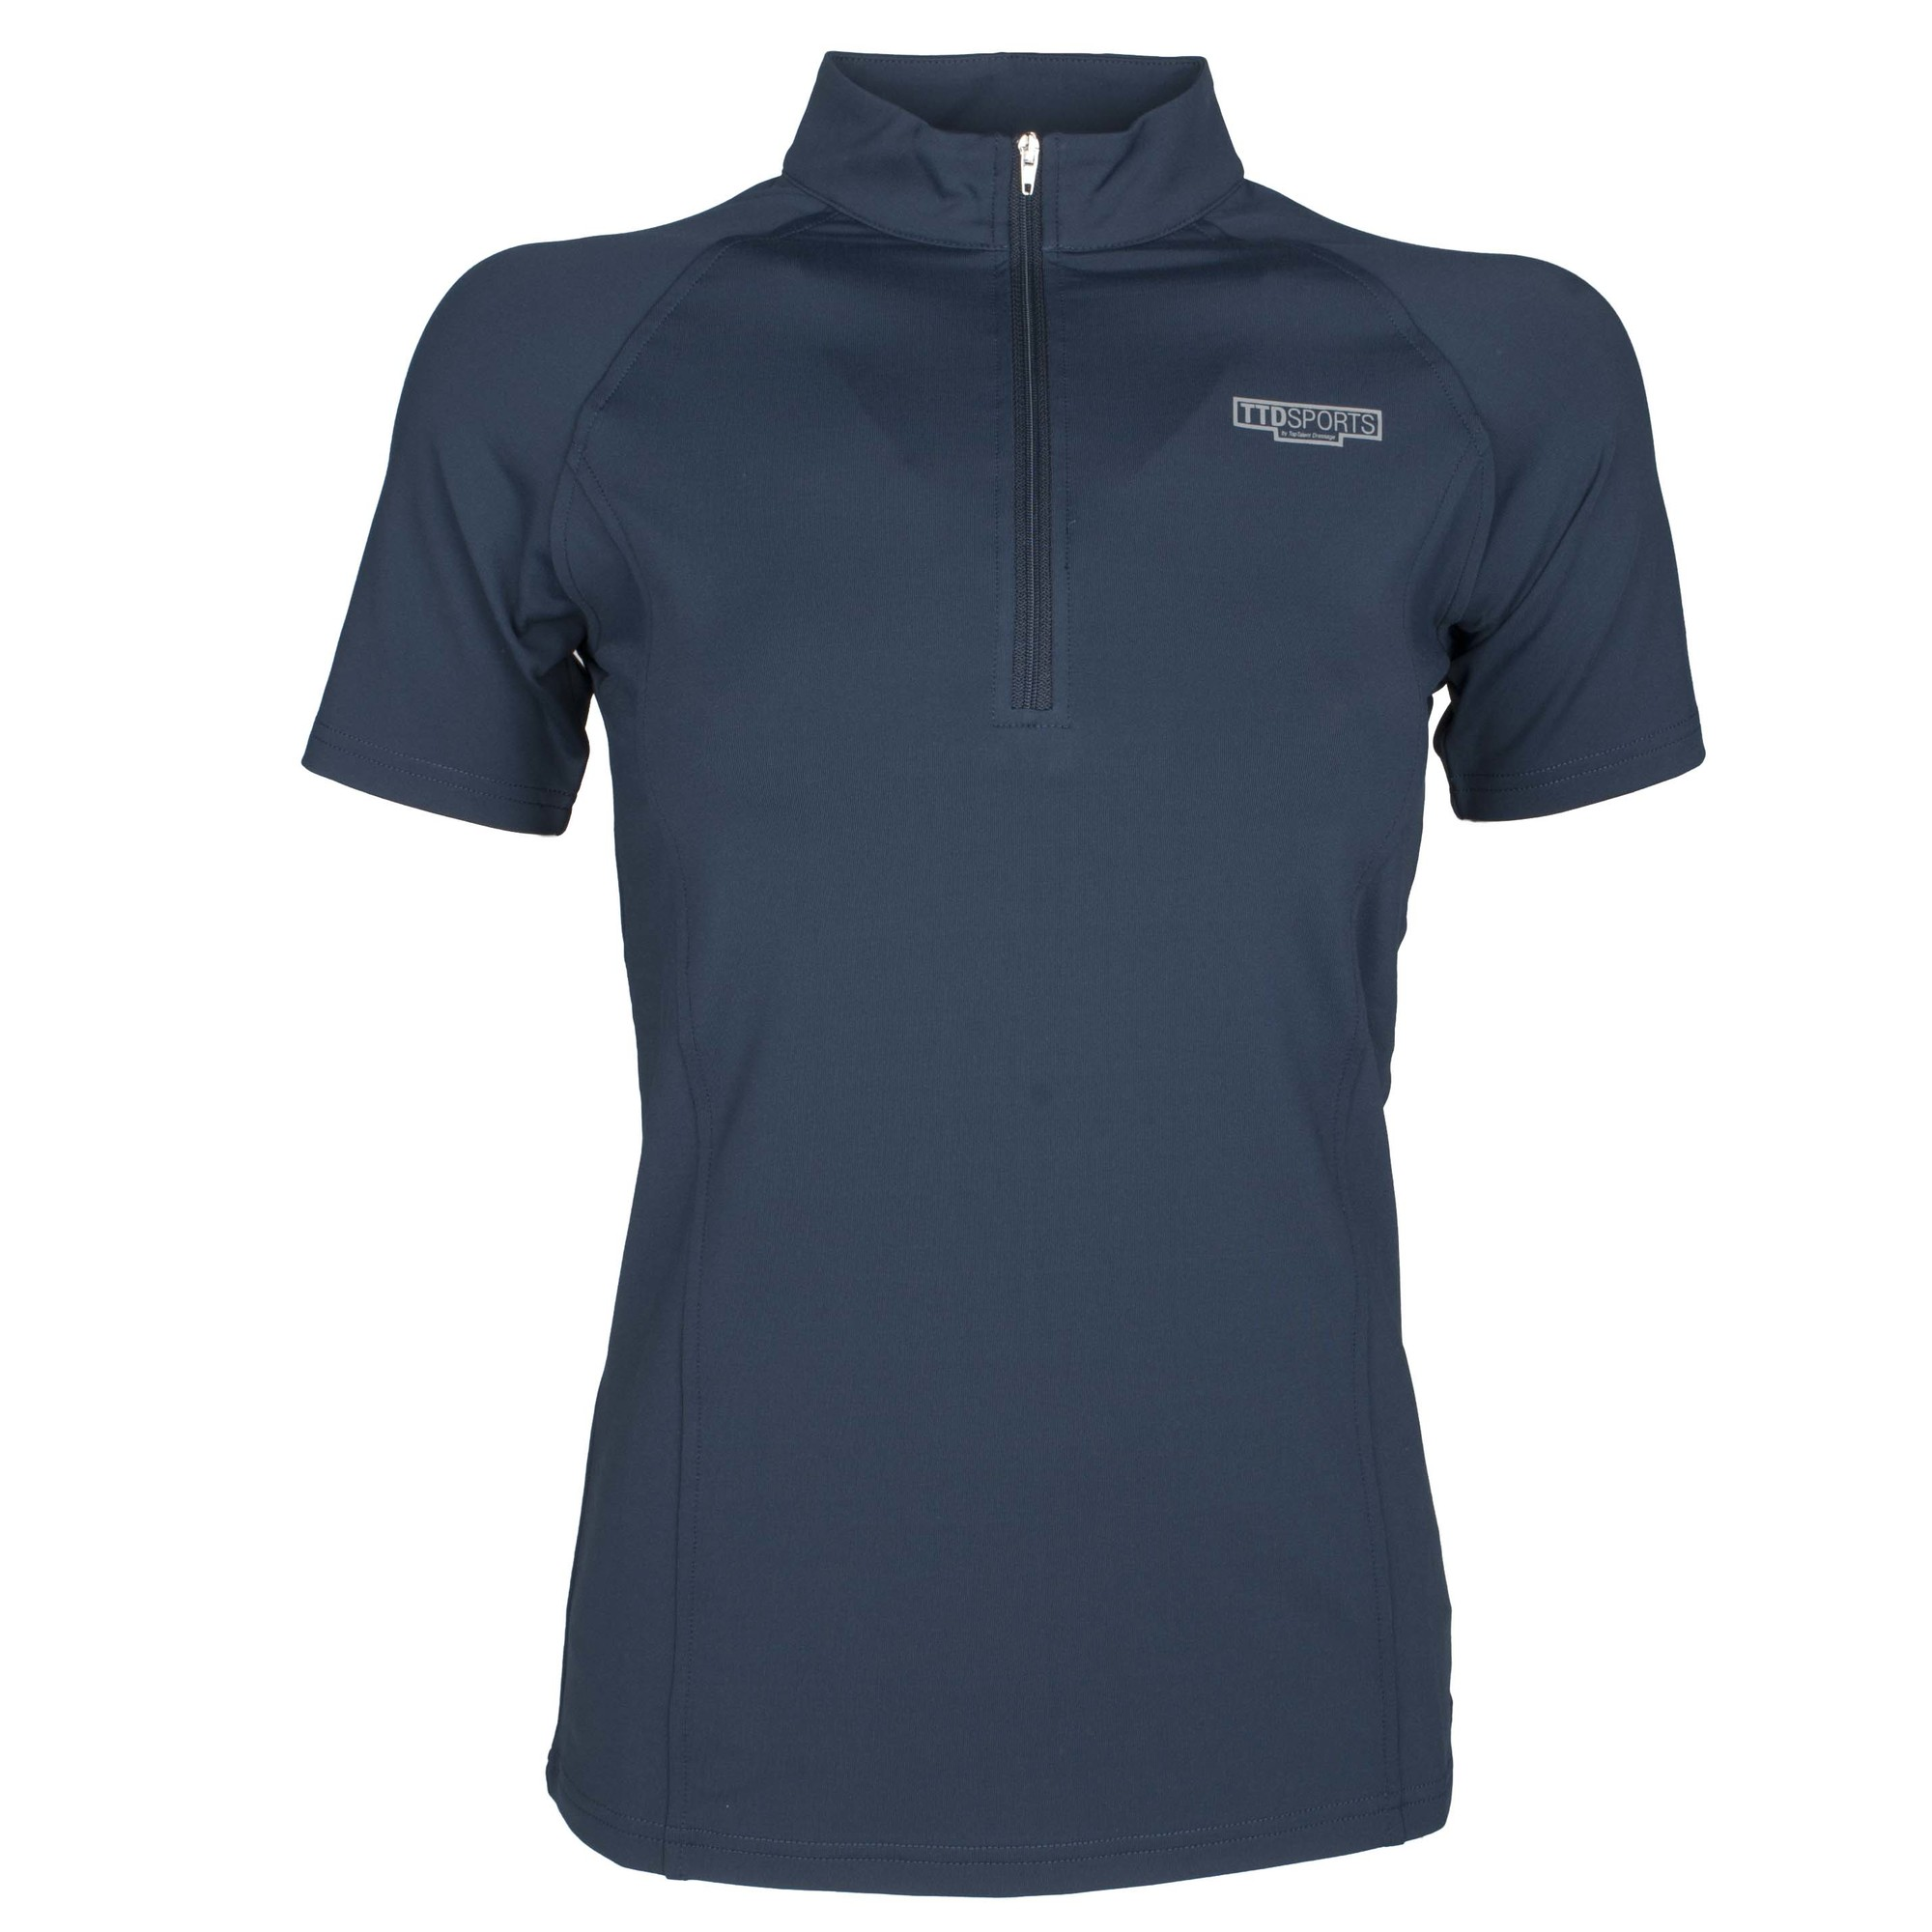 TTD Shaquille tshirt donkerblauw maat:xl